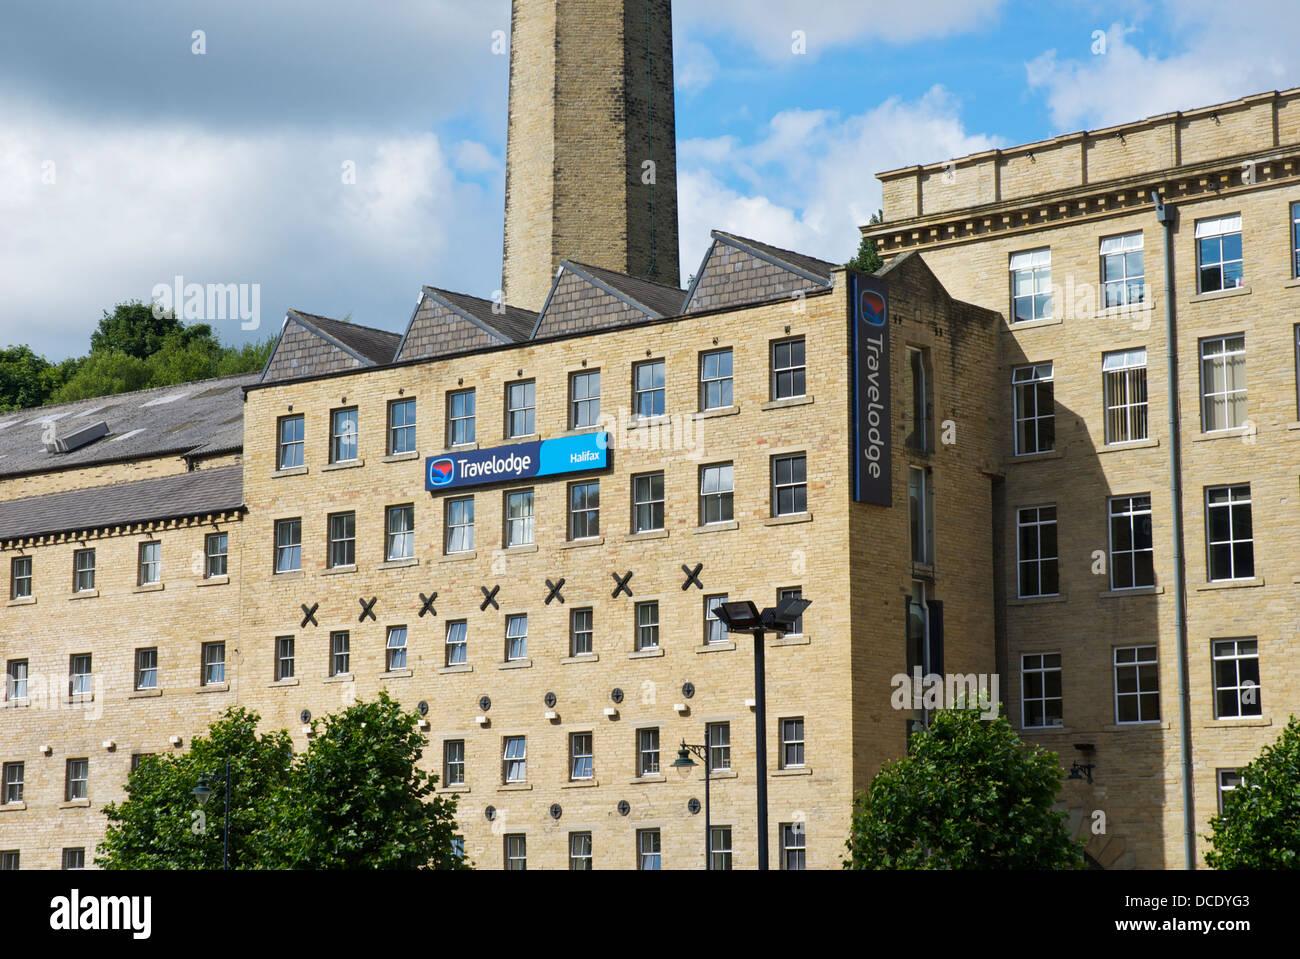 Travelodge And Uk Stock Photos  Travelodge And Uk Stock Images - Travelodge location map uk